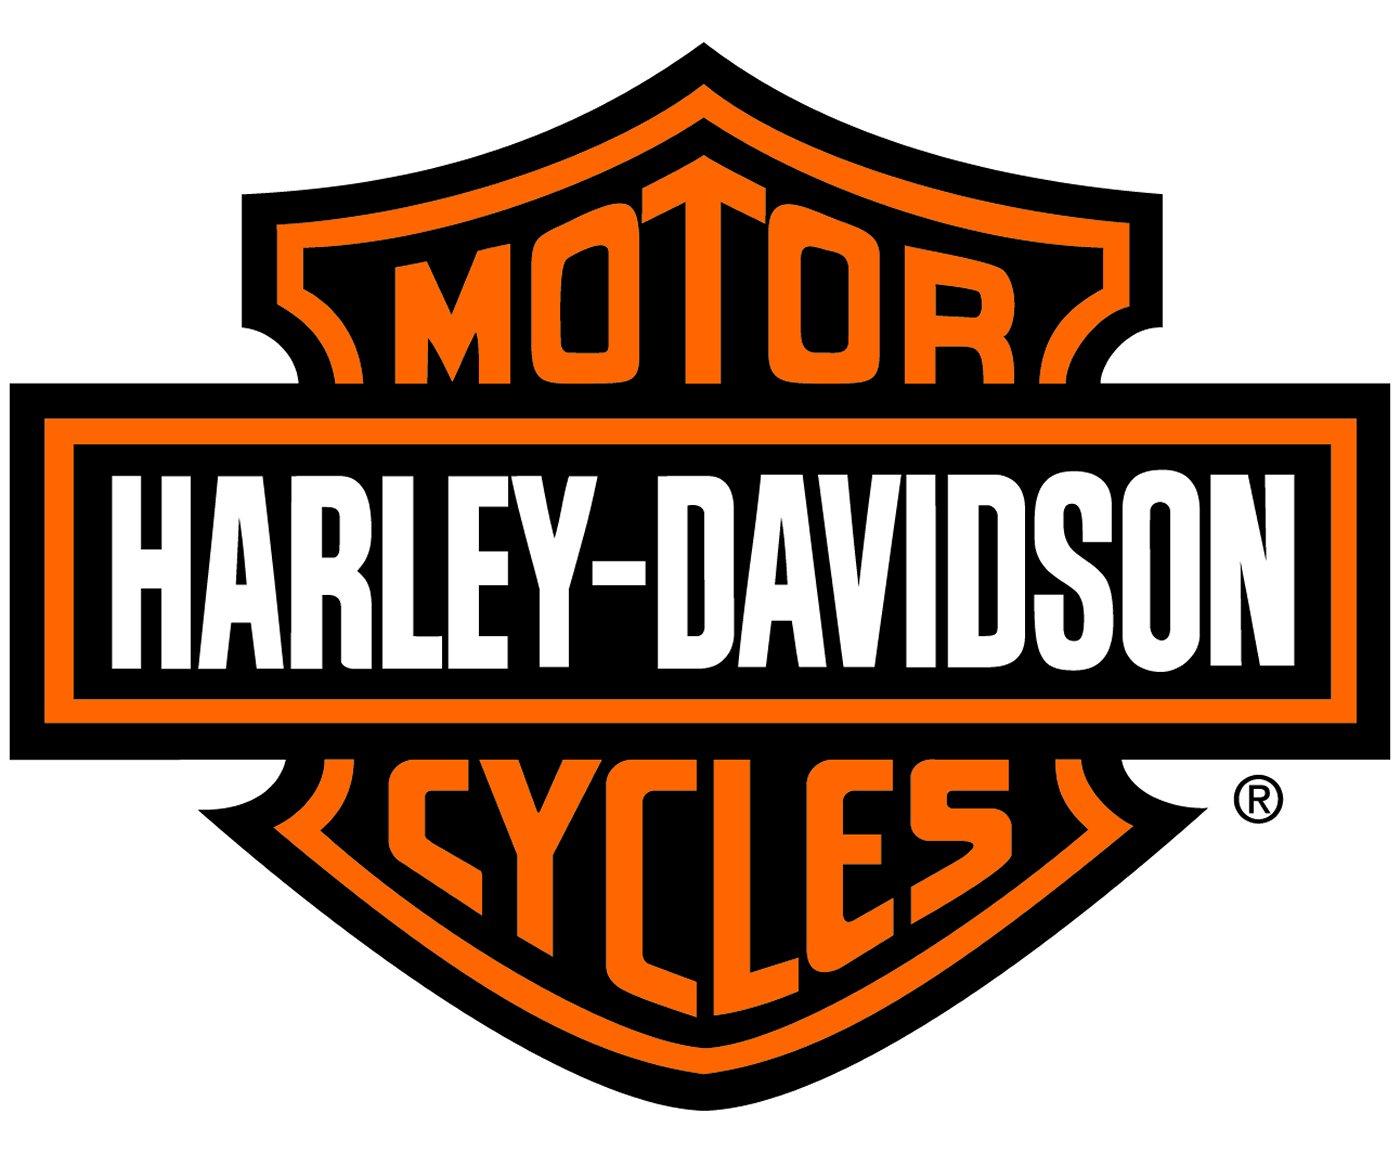 1400x1153 Harley Davidson Logo Clipart Harley Davidson Motorcycle Clipart 6